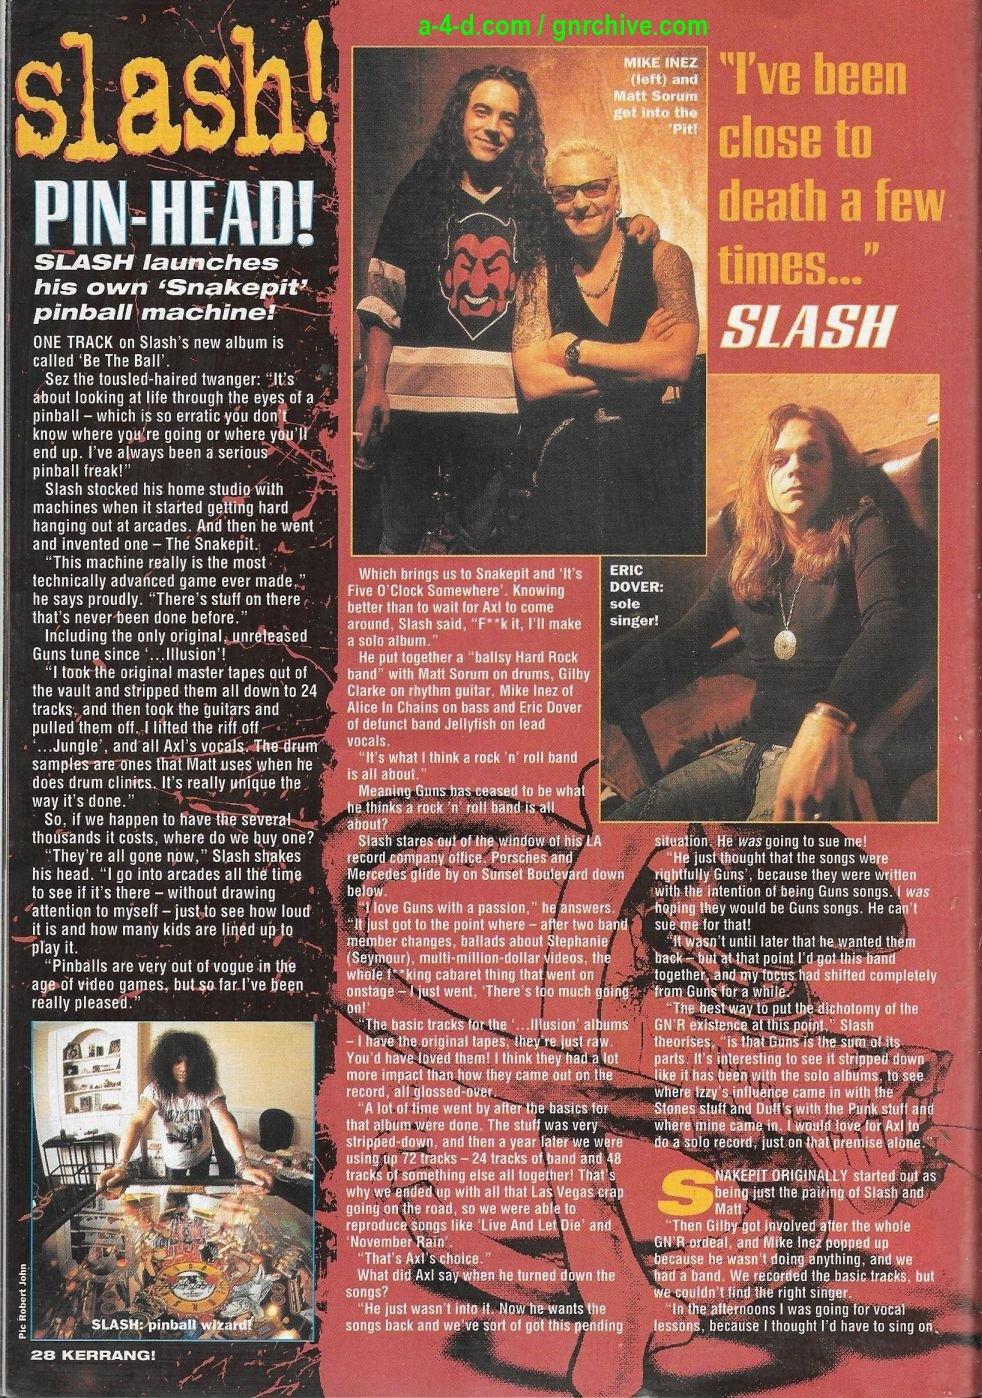 1995.02.18 - Kerrang! - Suicide! Lies! Axl! Snakes! Heavy Metal! (Slash) 1995_067